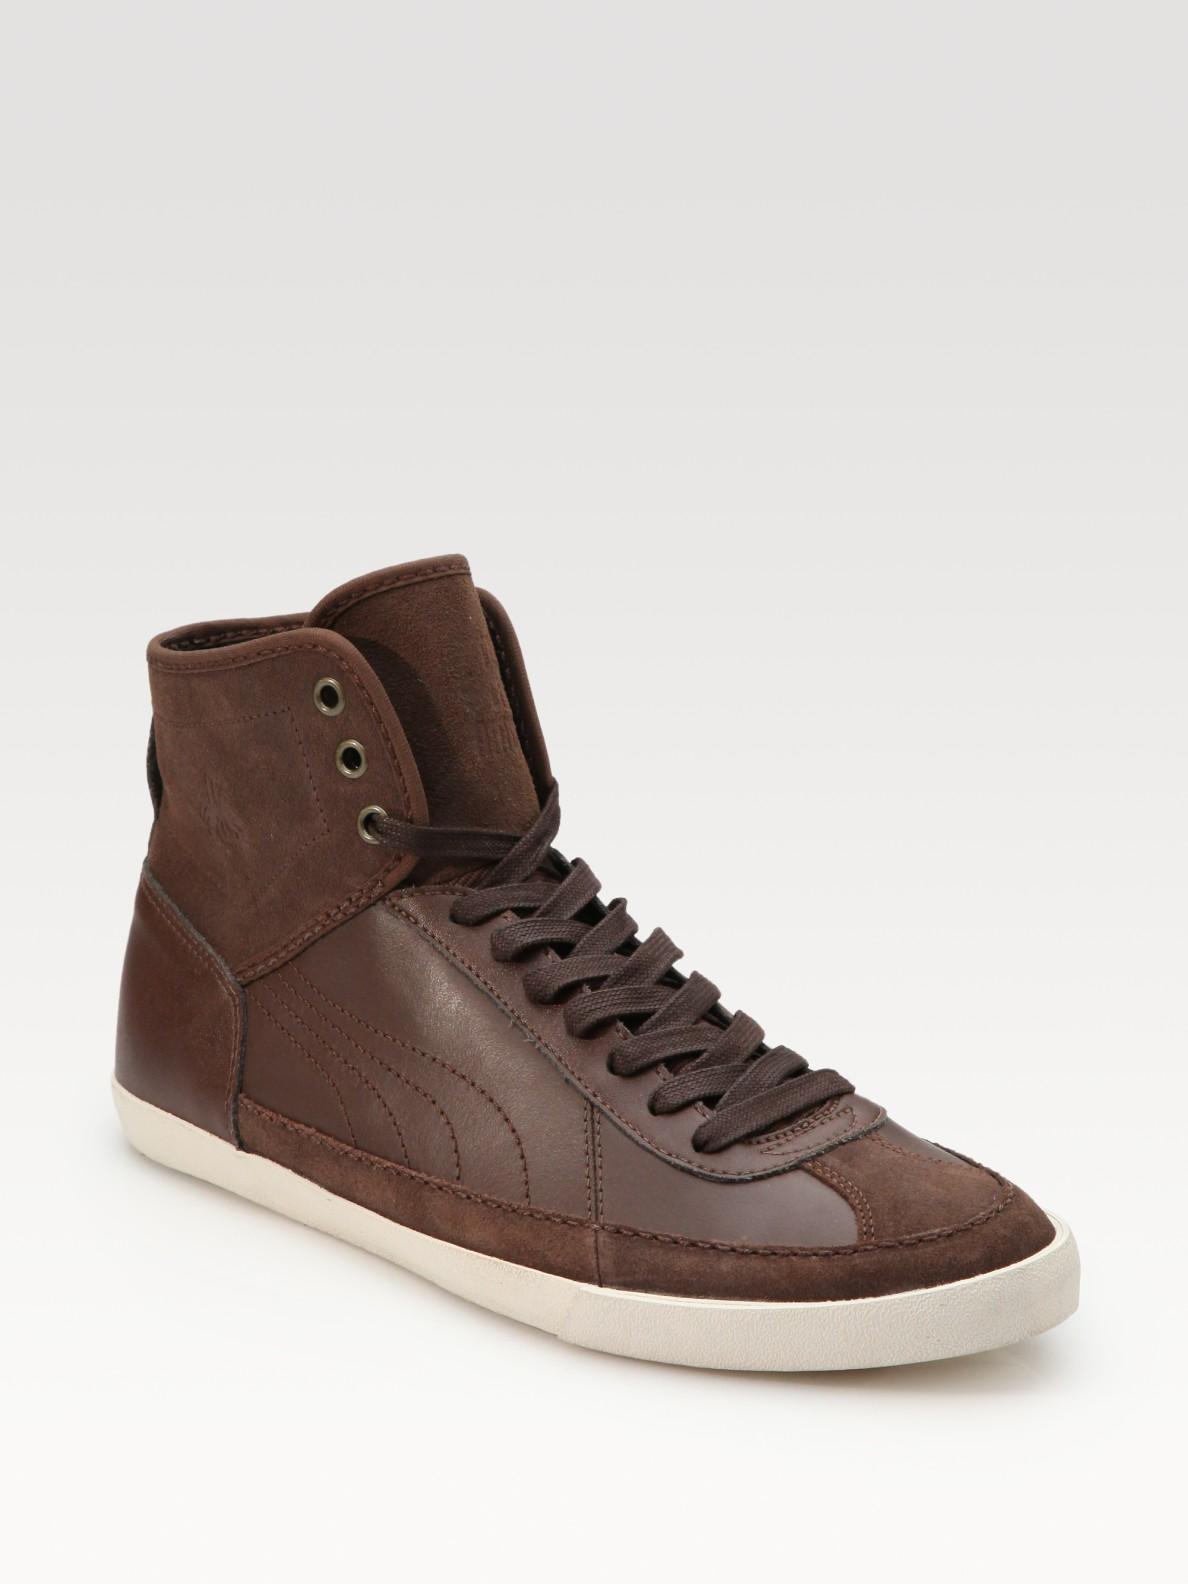 Puma Formal Shoes